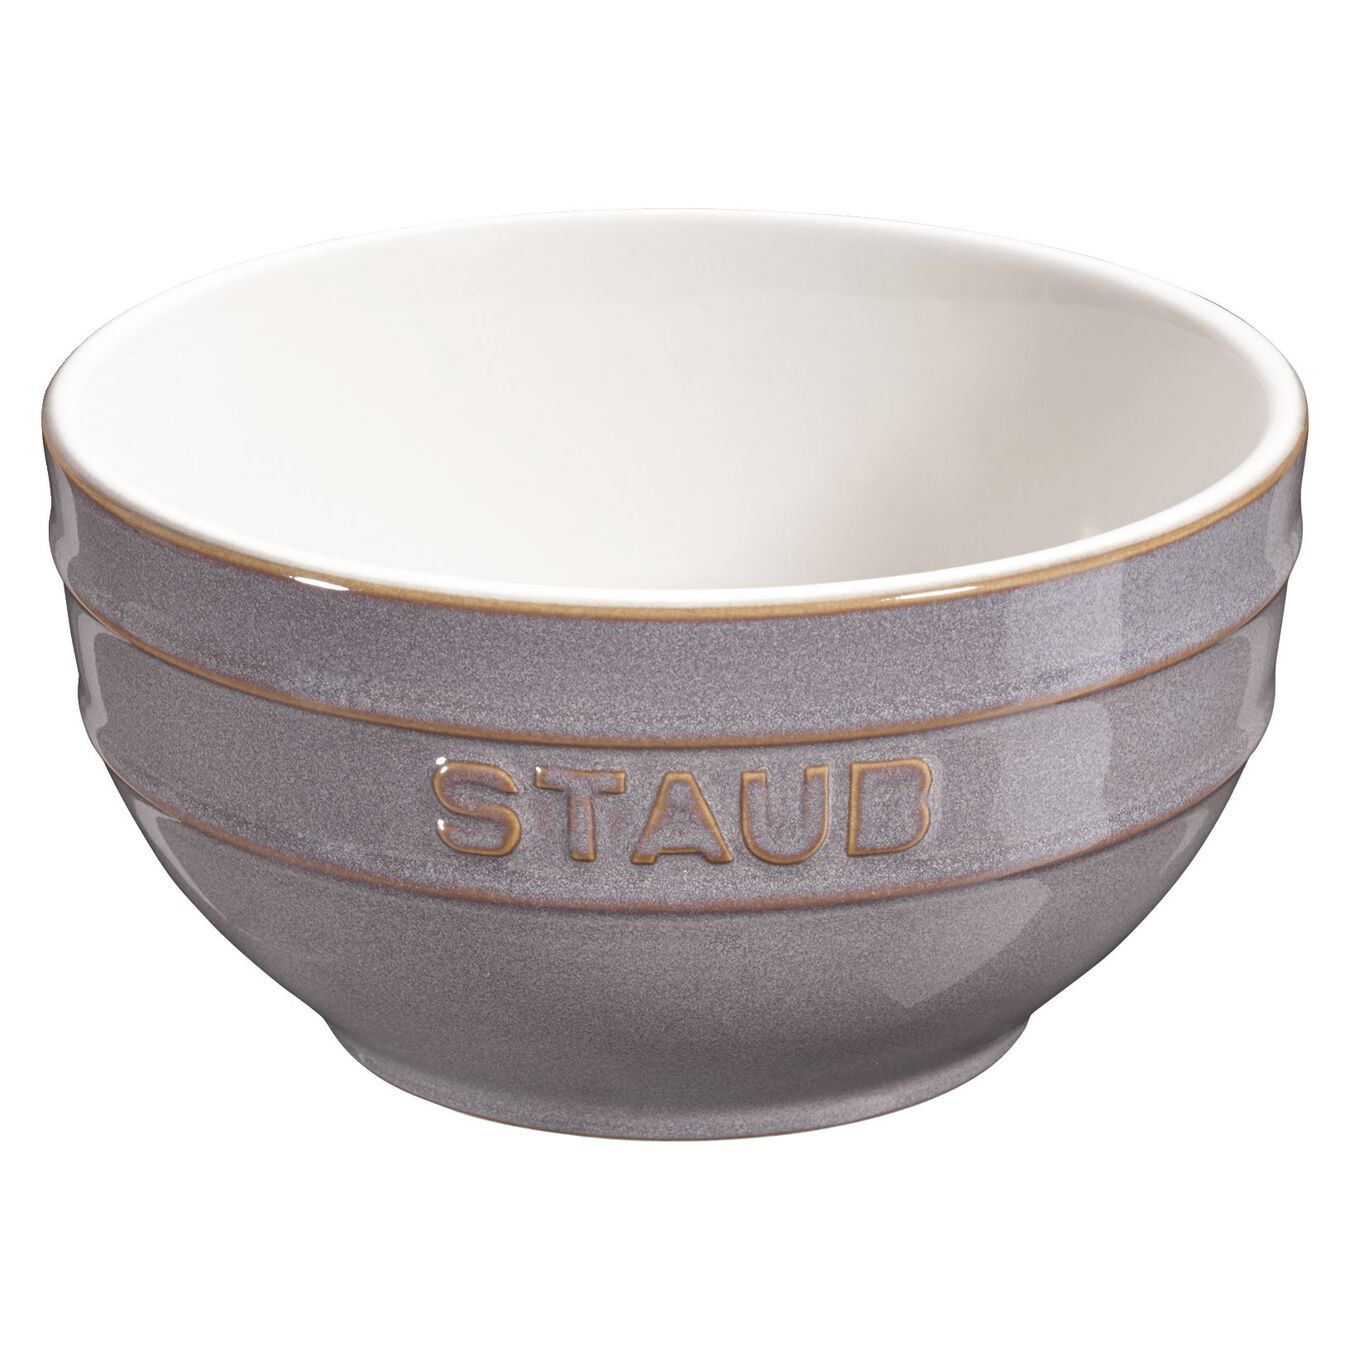 Schüssel 12 cm, Keramik, Antik-Grau,,large 1